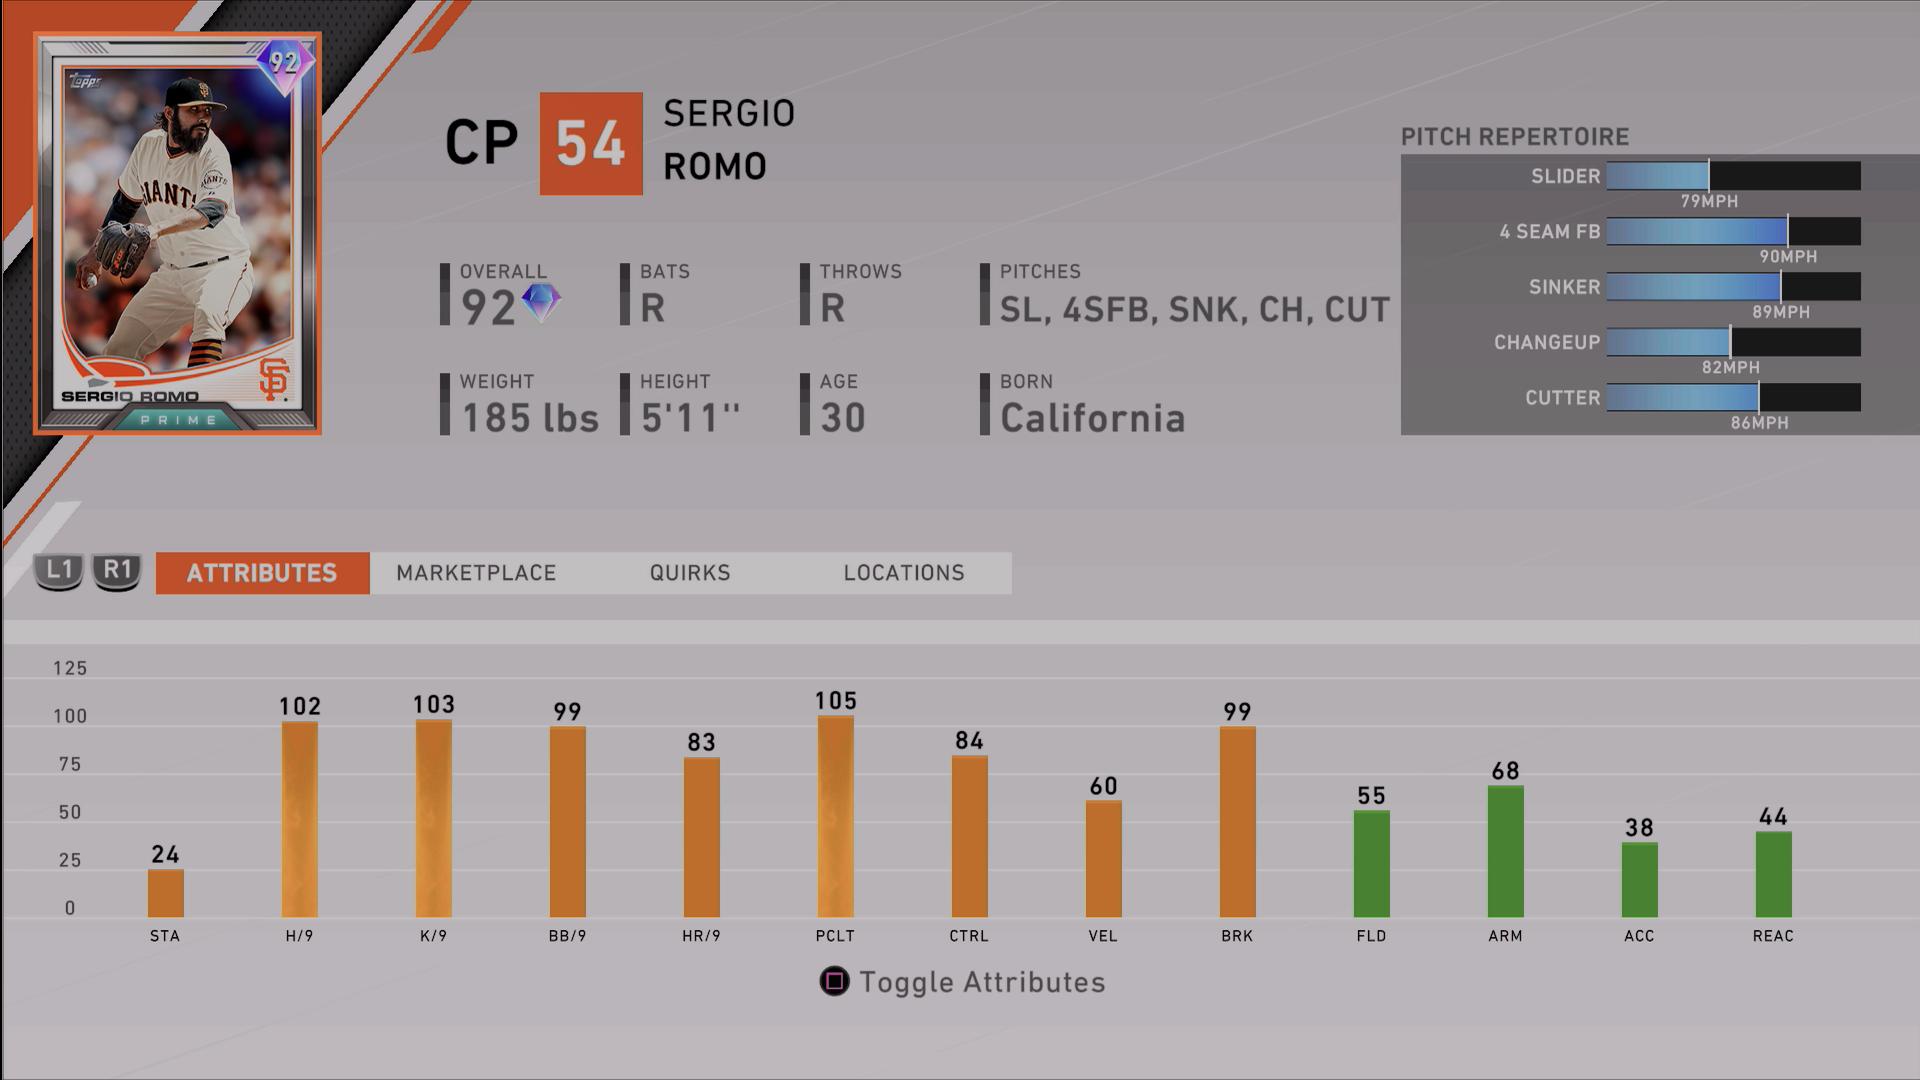 mlb-the-show-20-7th-inning-program-prime-sergio-romo-ratings